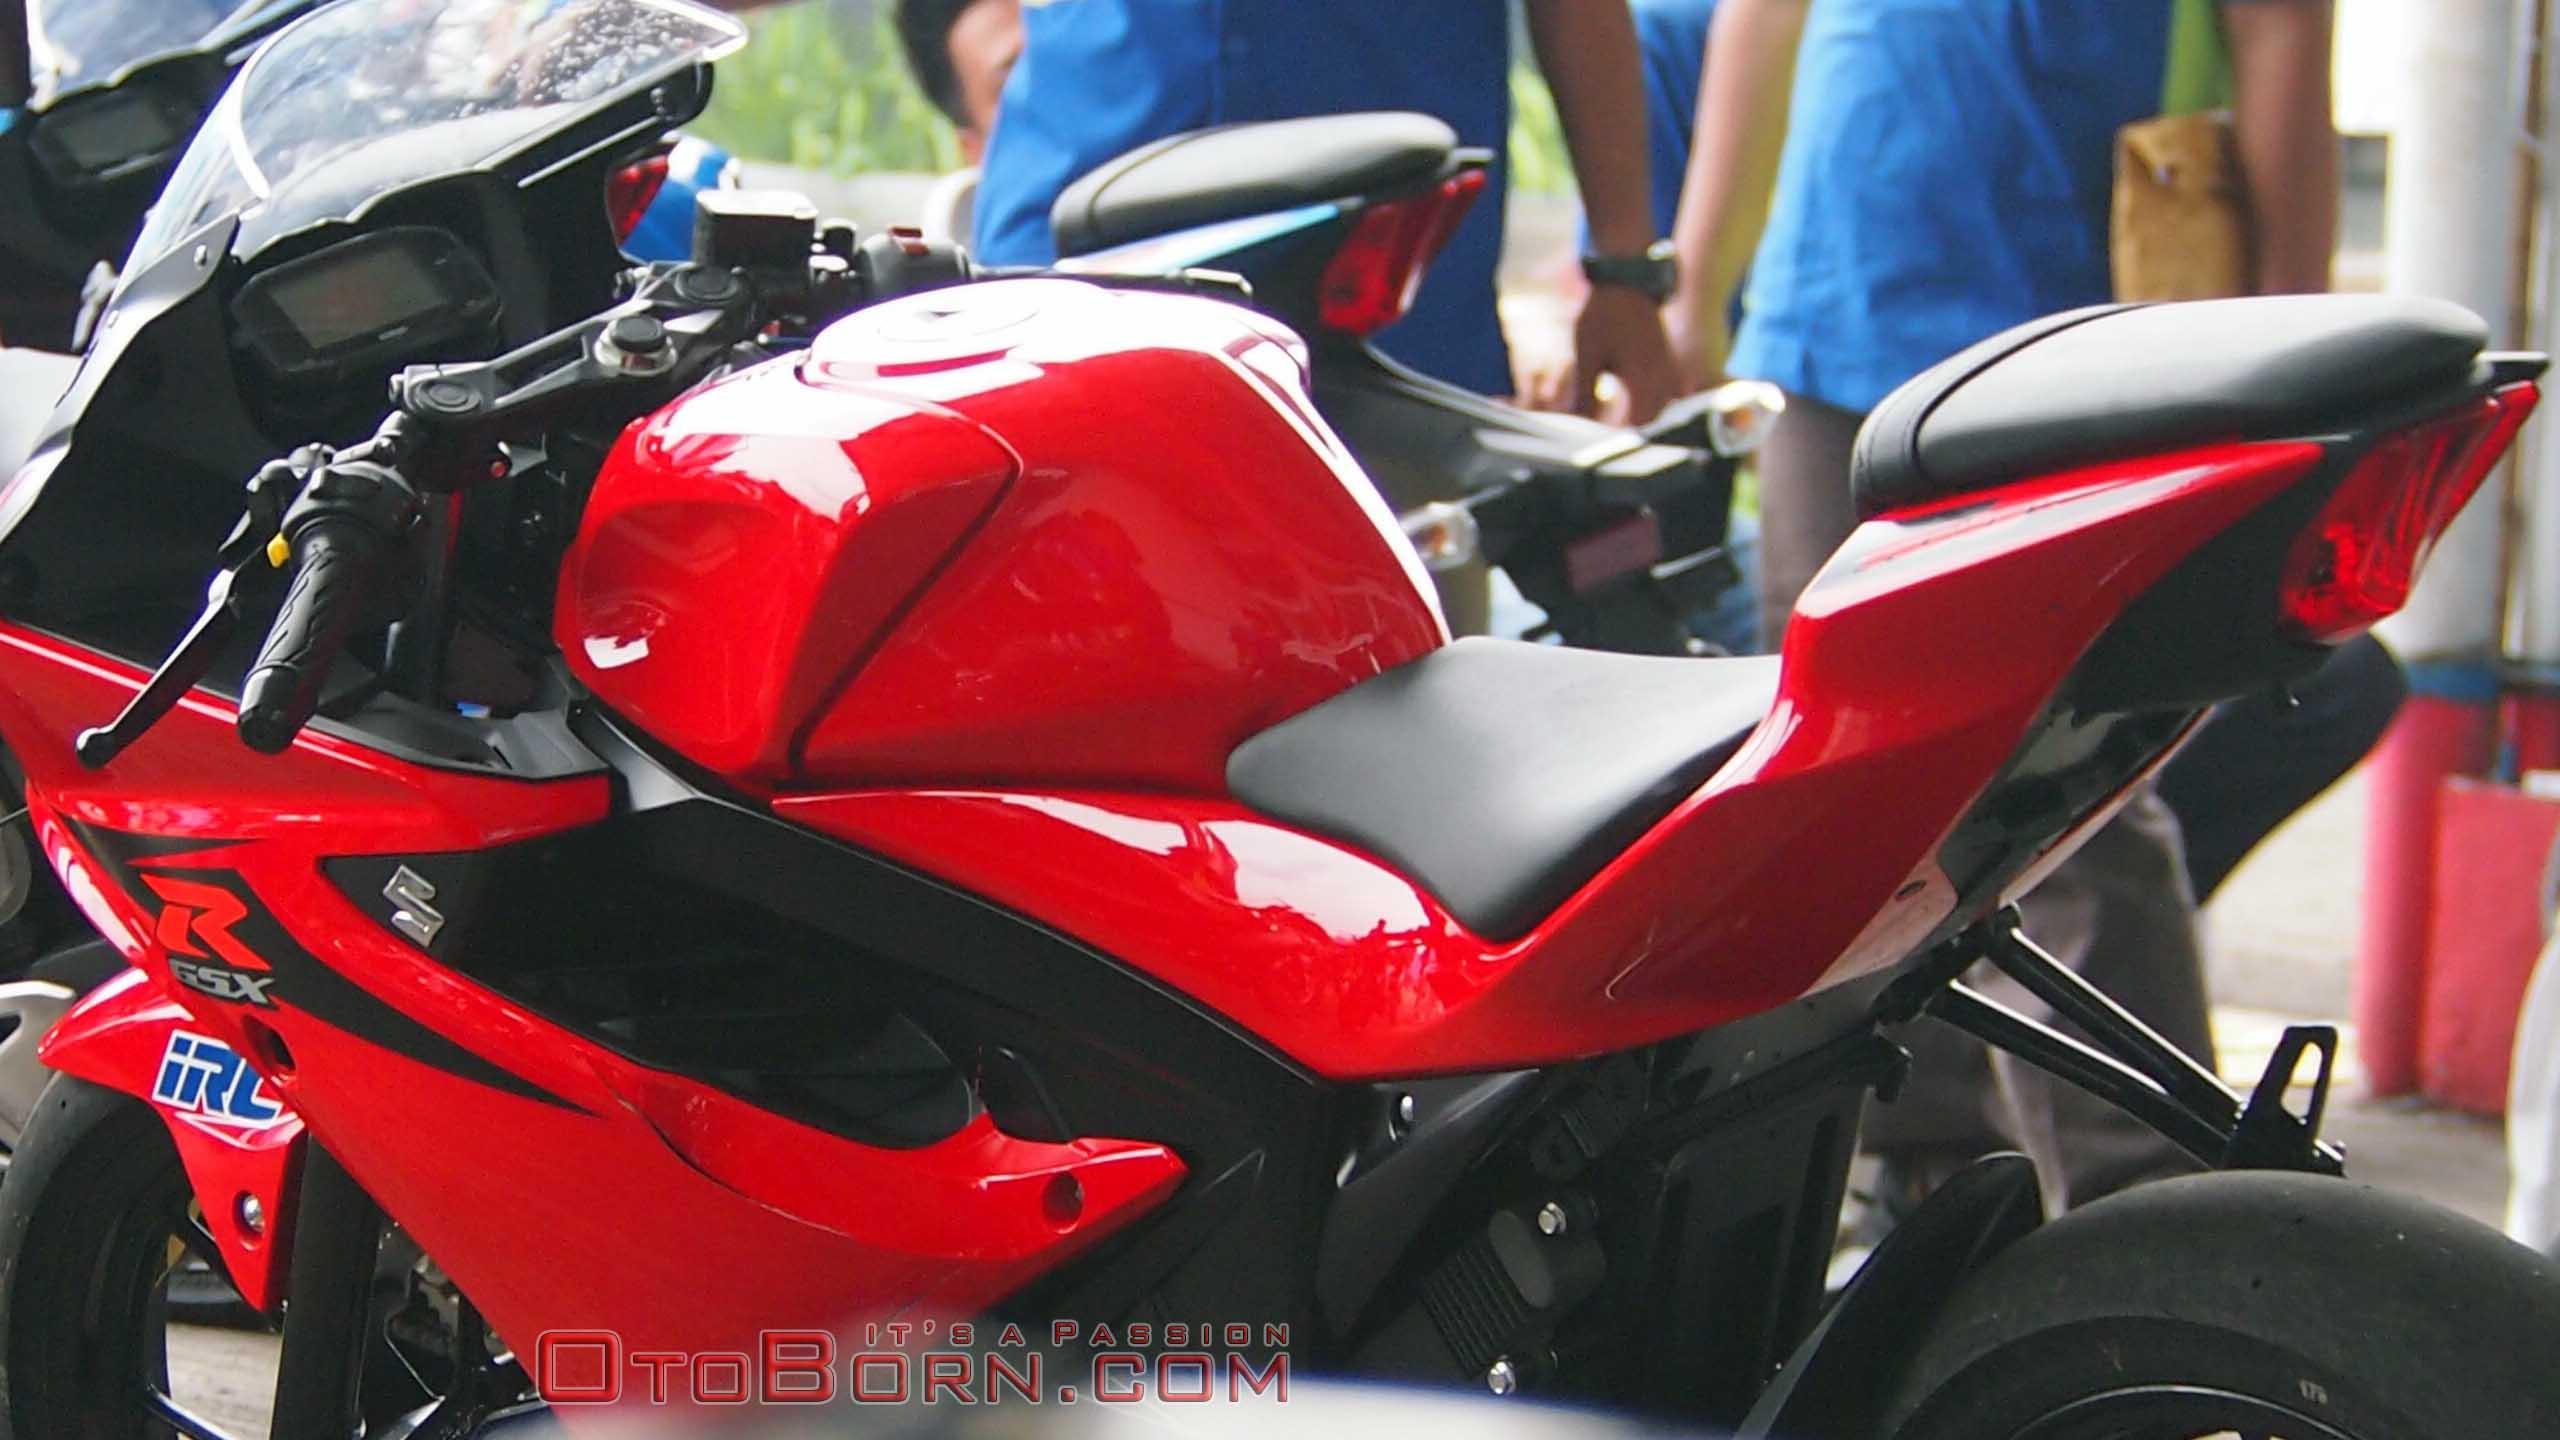 Kumpulan Gambar Modifikasi Motor Gsx R150 Terbaru Dan Terupdate